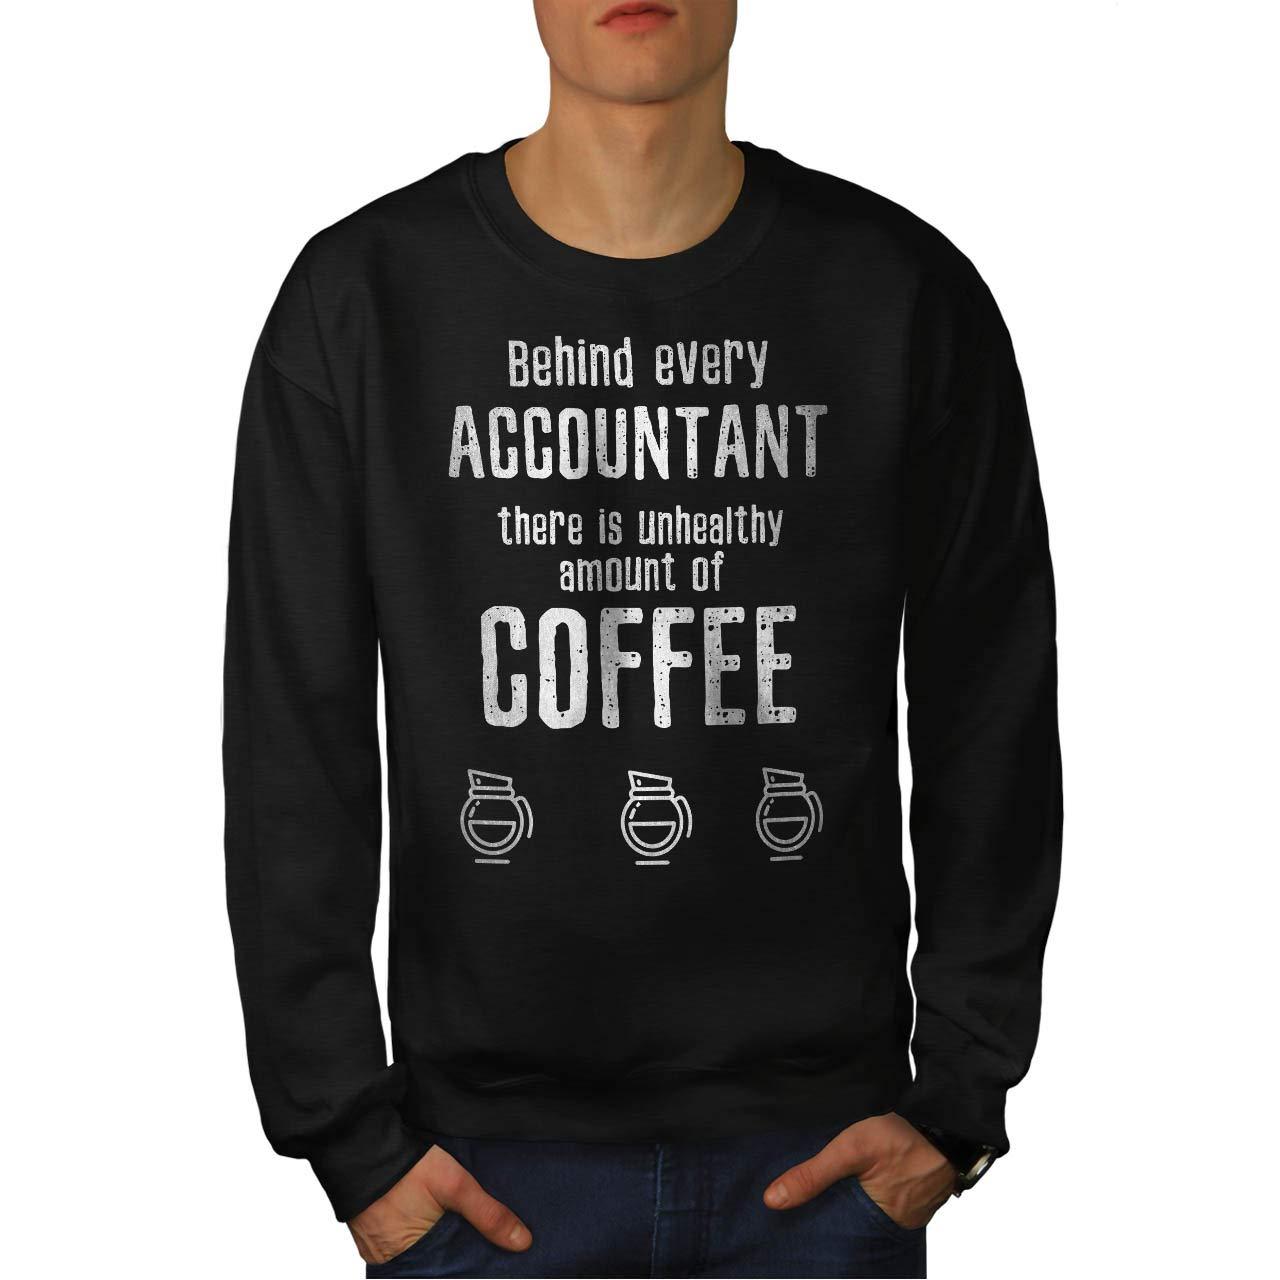 Job Funny Casual Jumper wellcoda Accountant Coffe Mens Sweatshirt